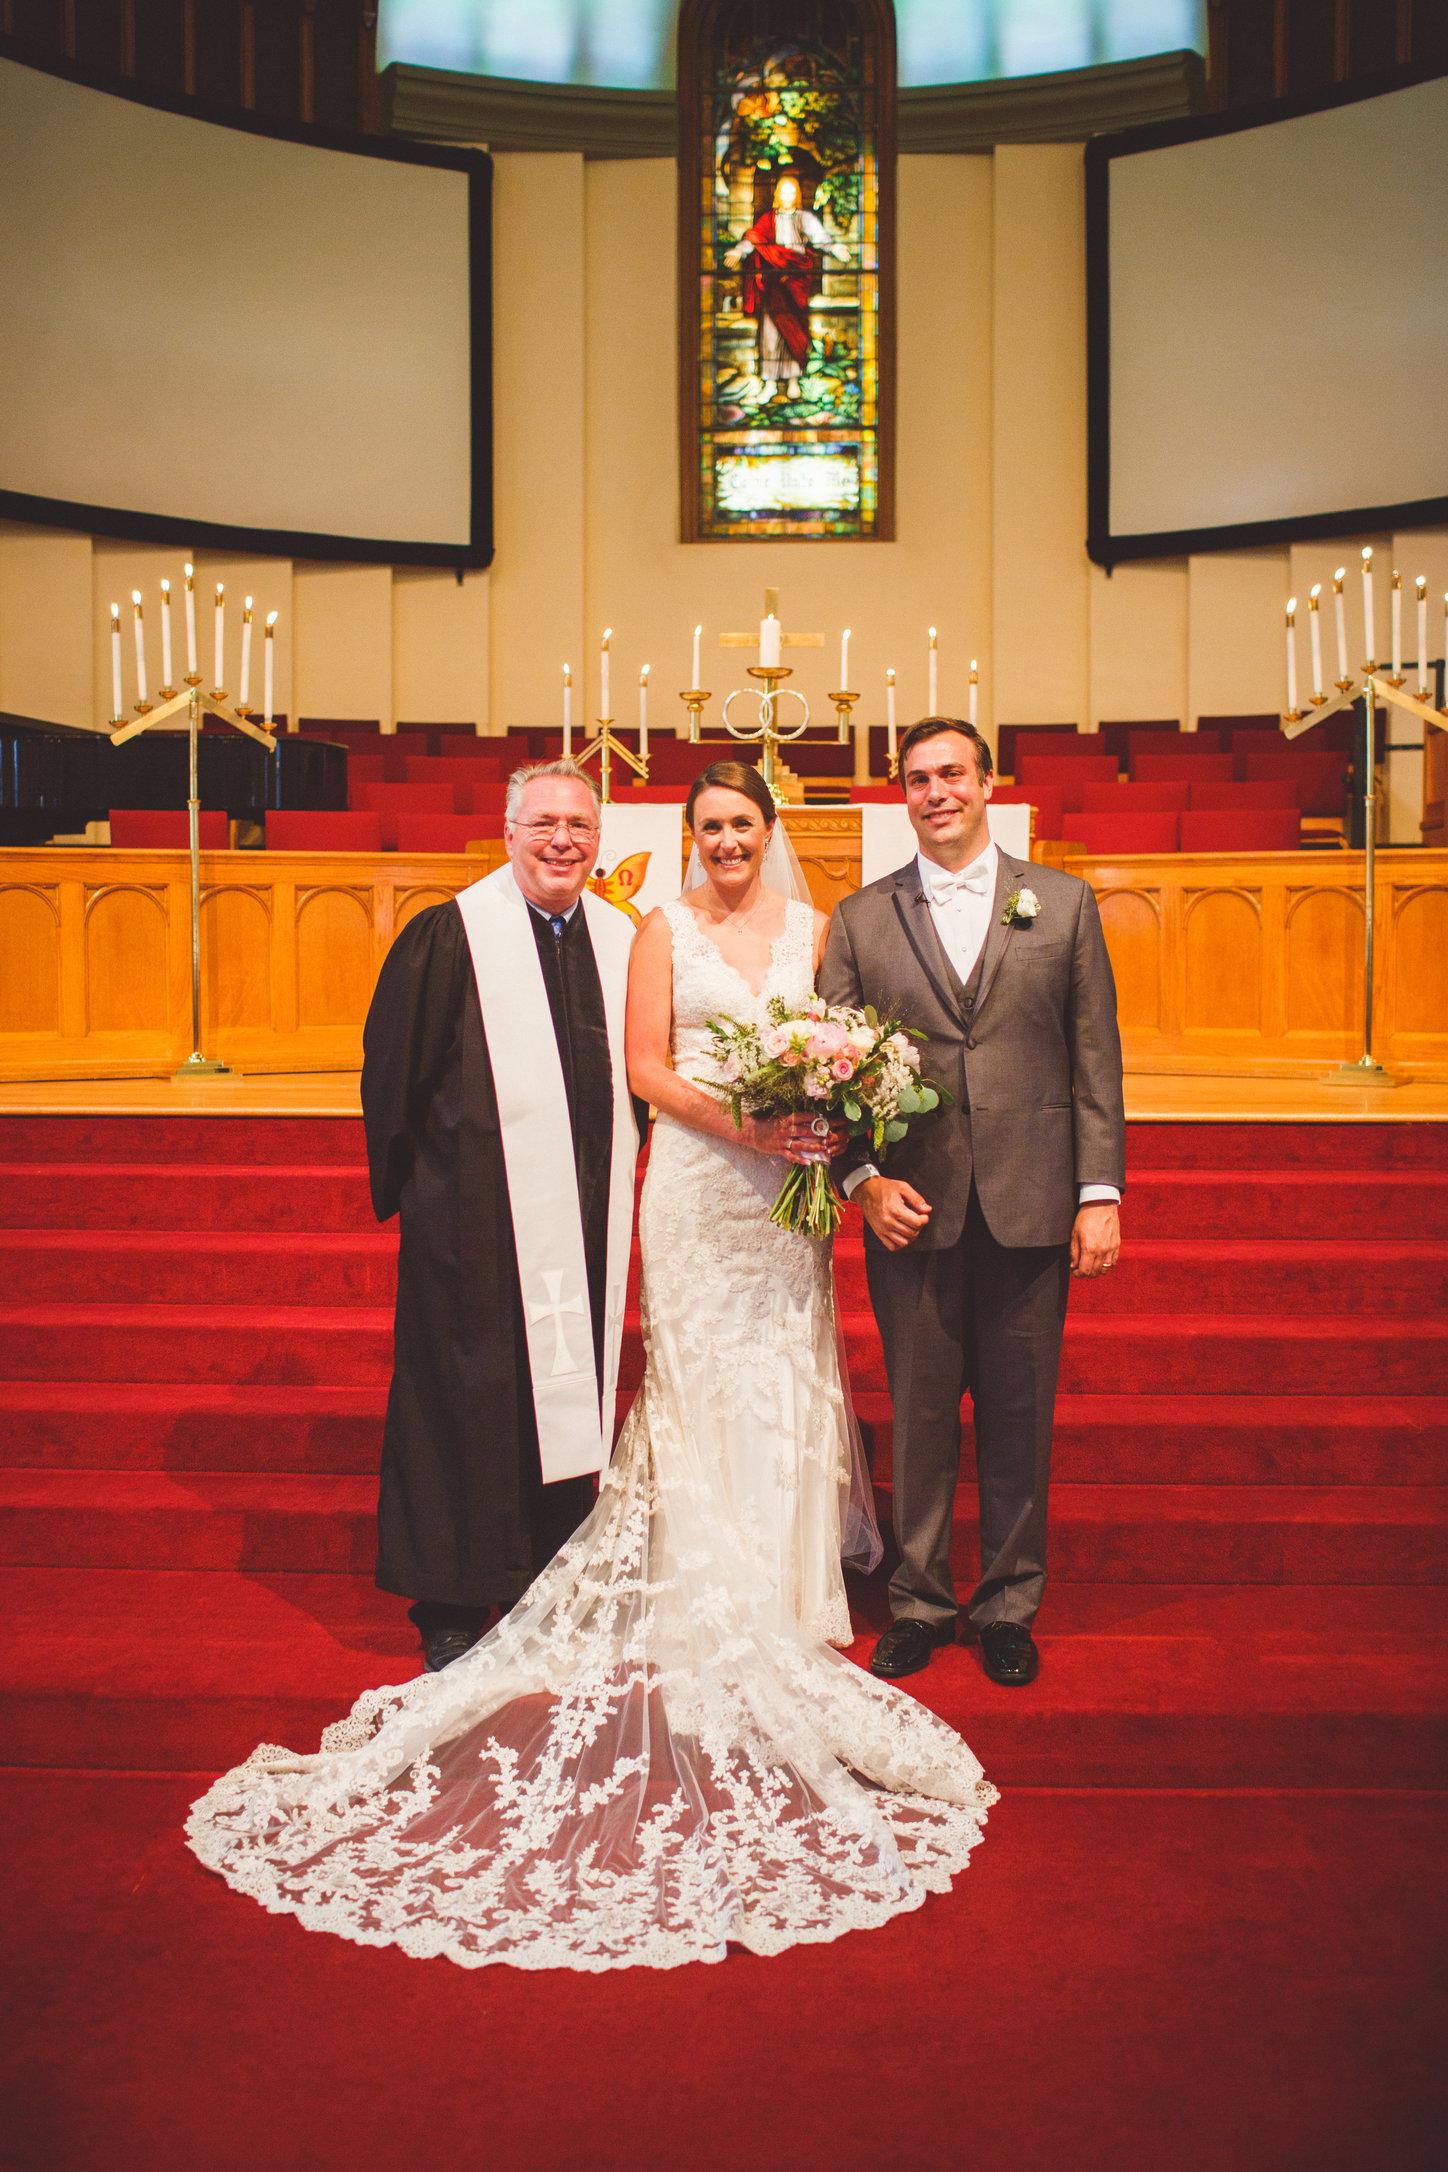 SandC-wedding-247.jpg